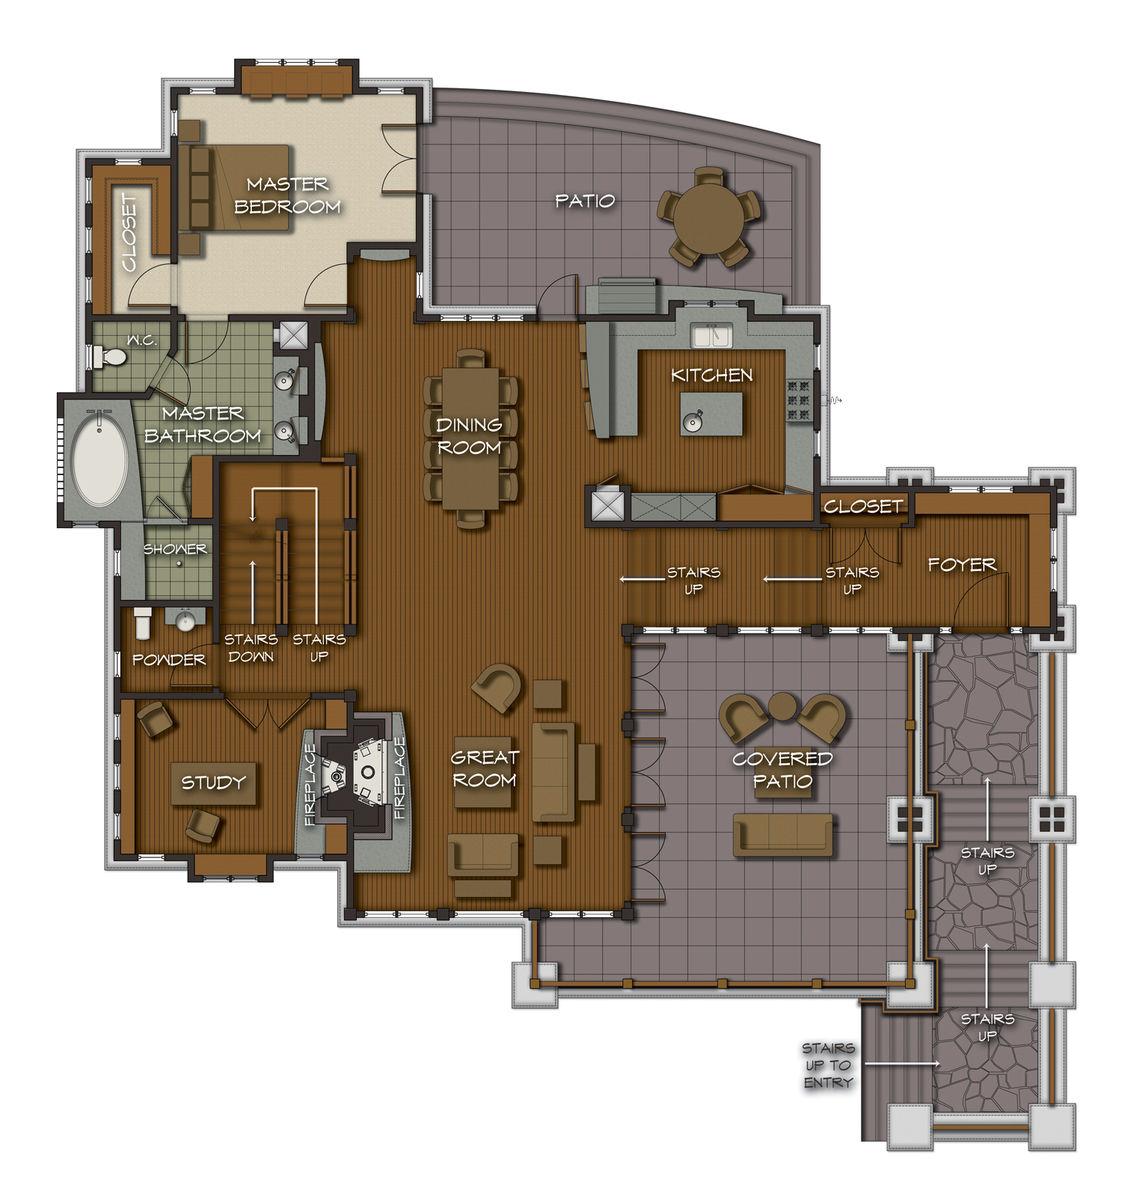 The Castle Rock Floor Plan By Canadian Timber Frames Ltd